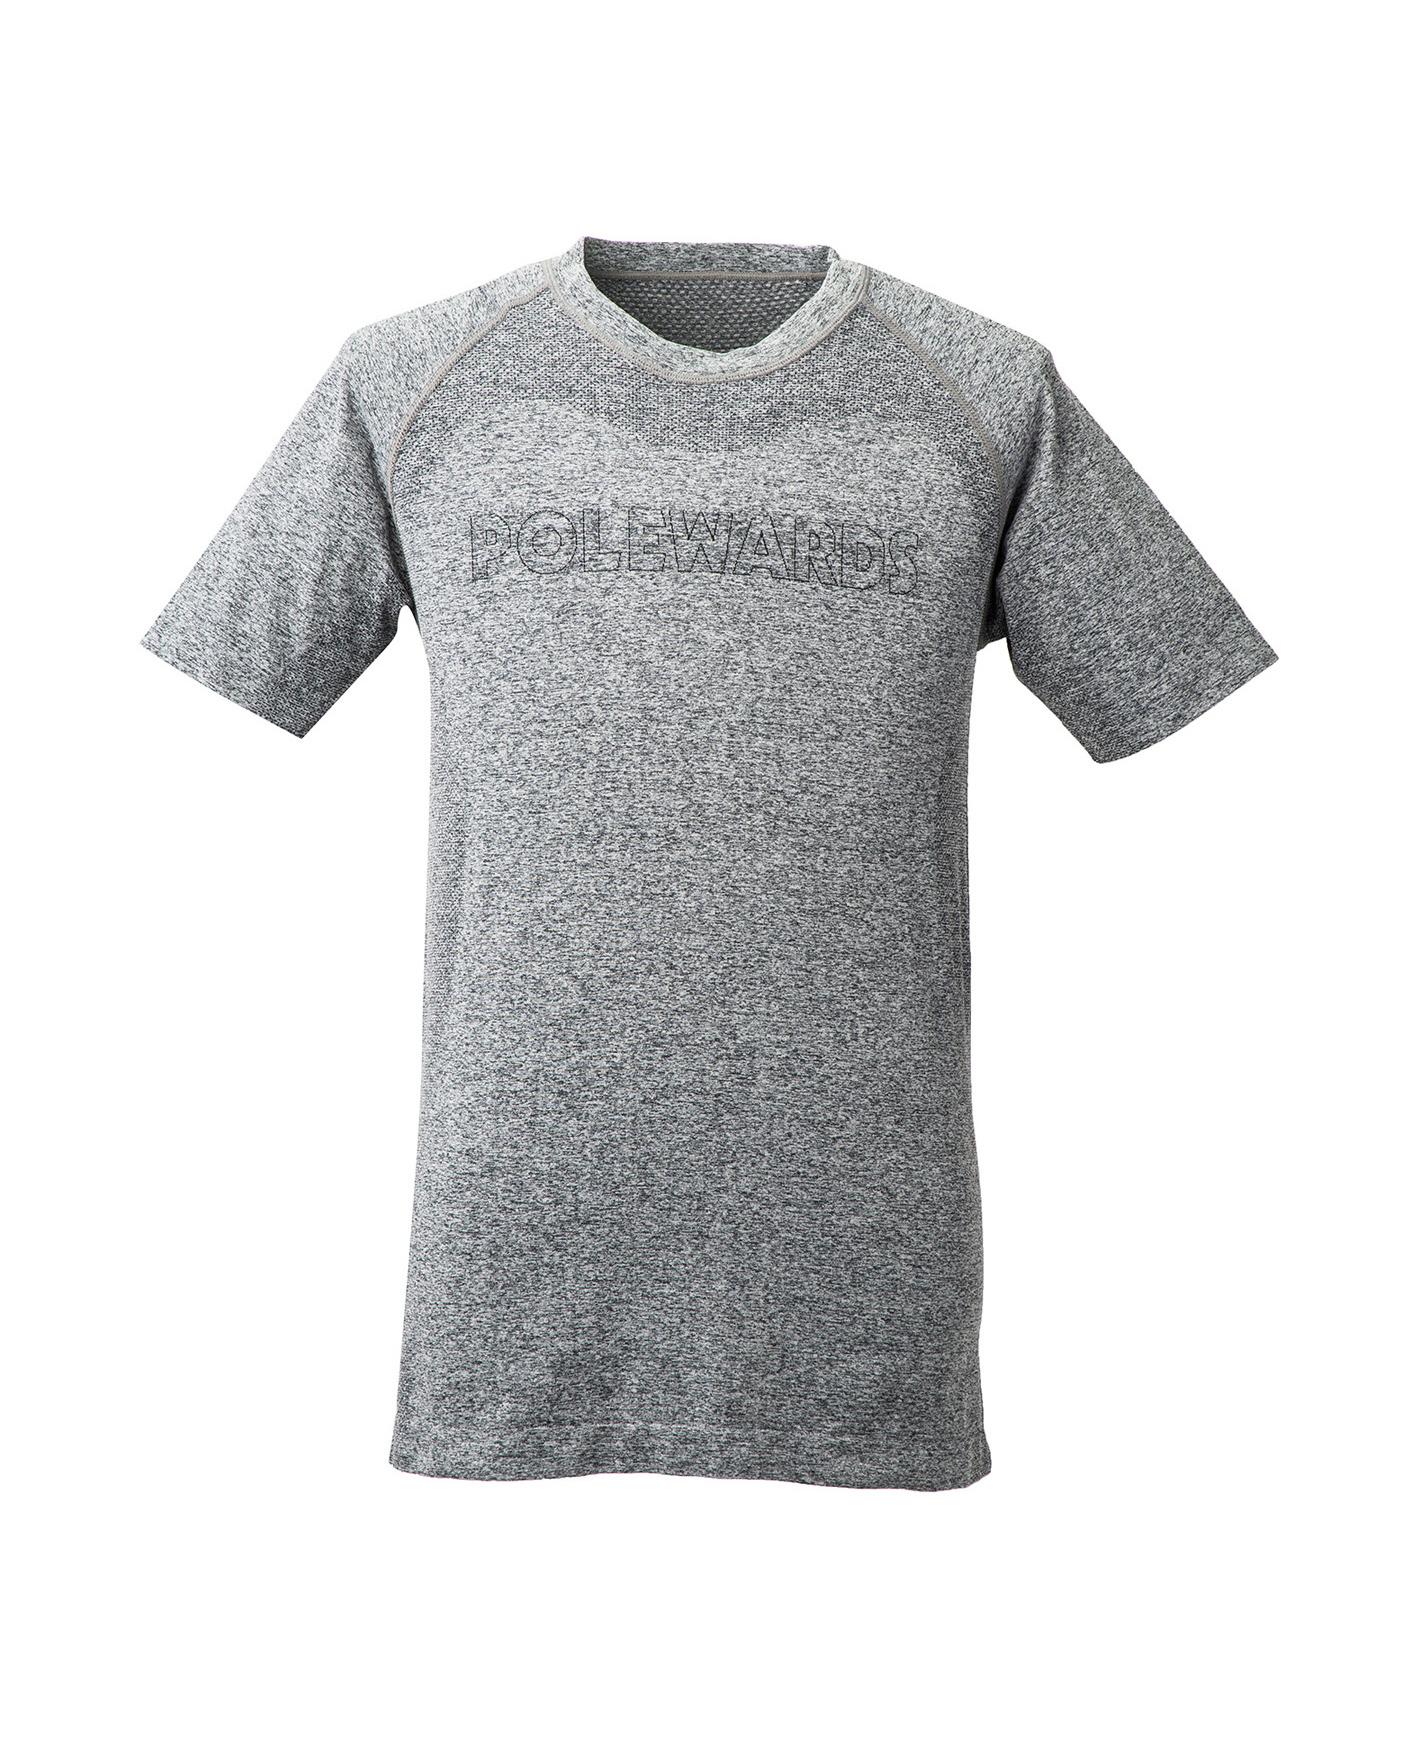 Seamless Crew Neck Tshirt H/S(シームレス クルーネックTシャツ)